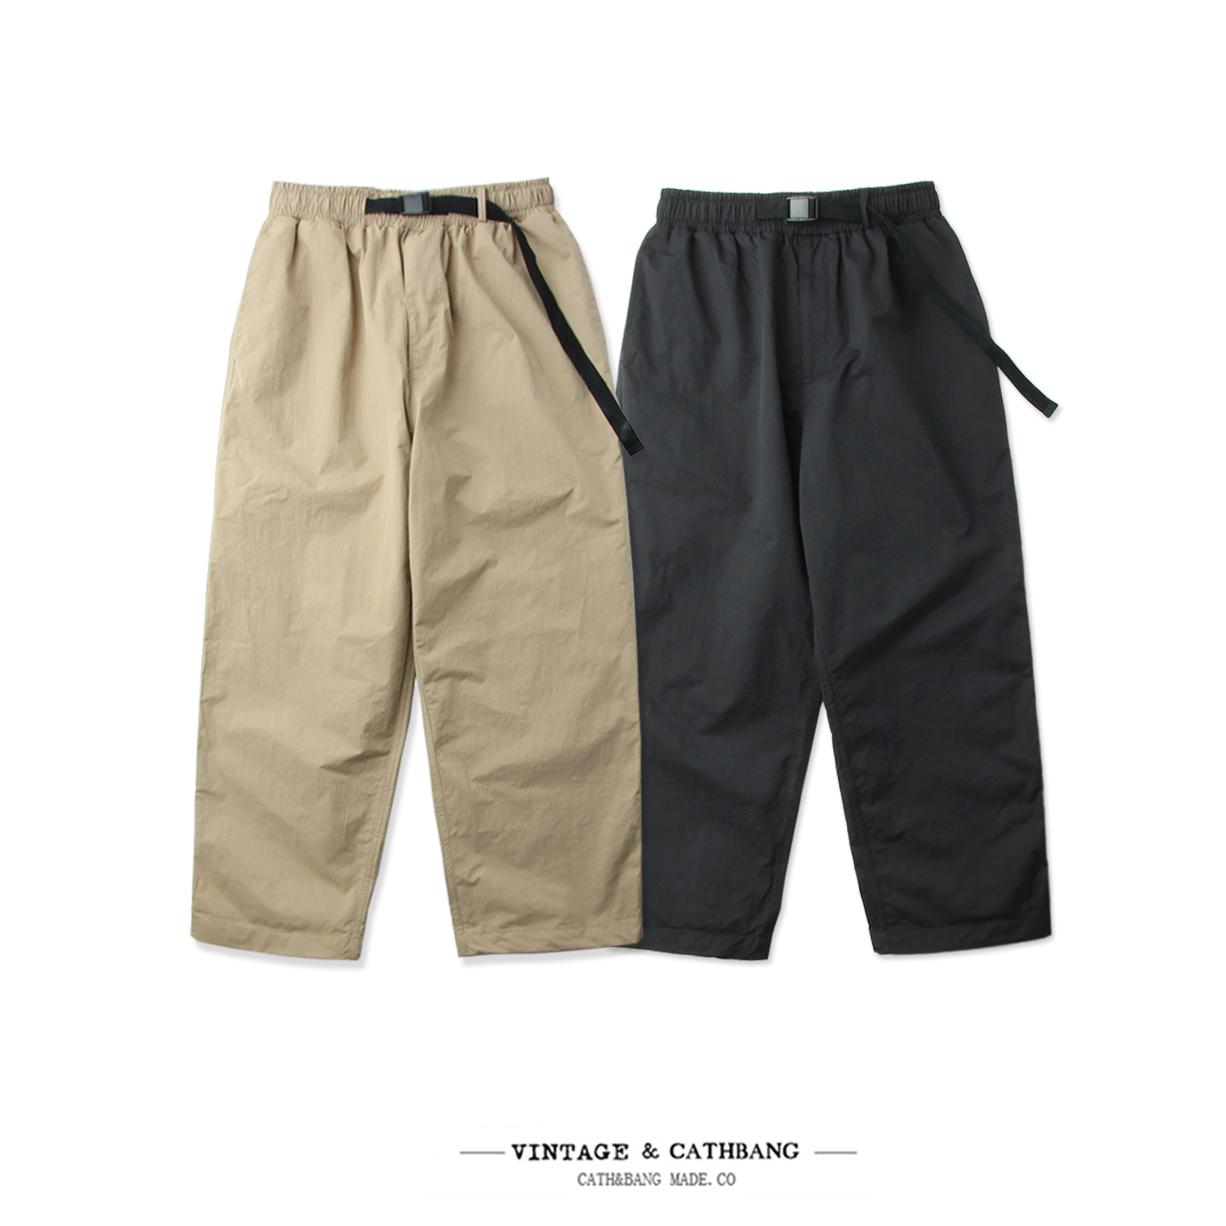 Cath&Bang潮牌夏季薄款潮流日系复古男款超宽松男女9分直筒工装裤